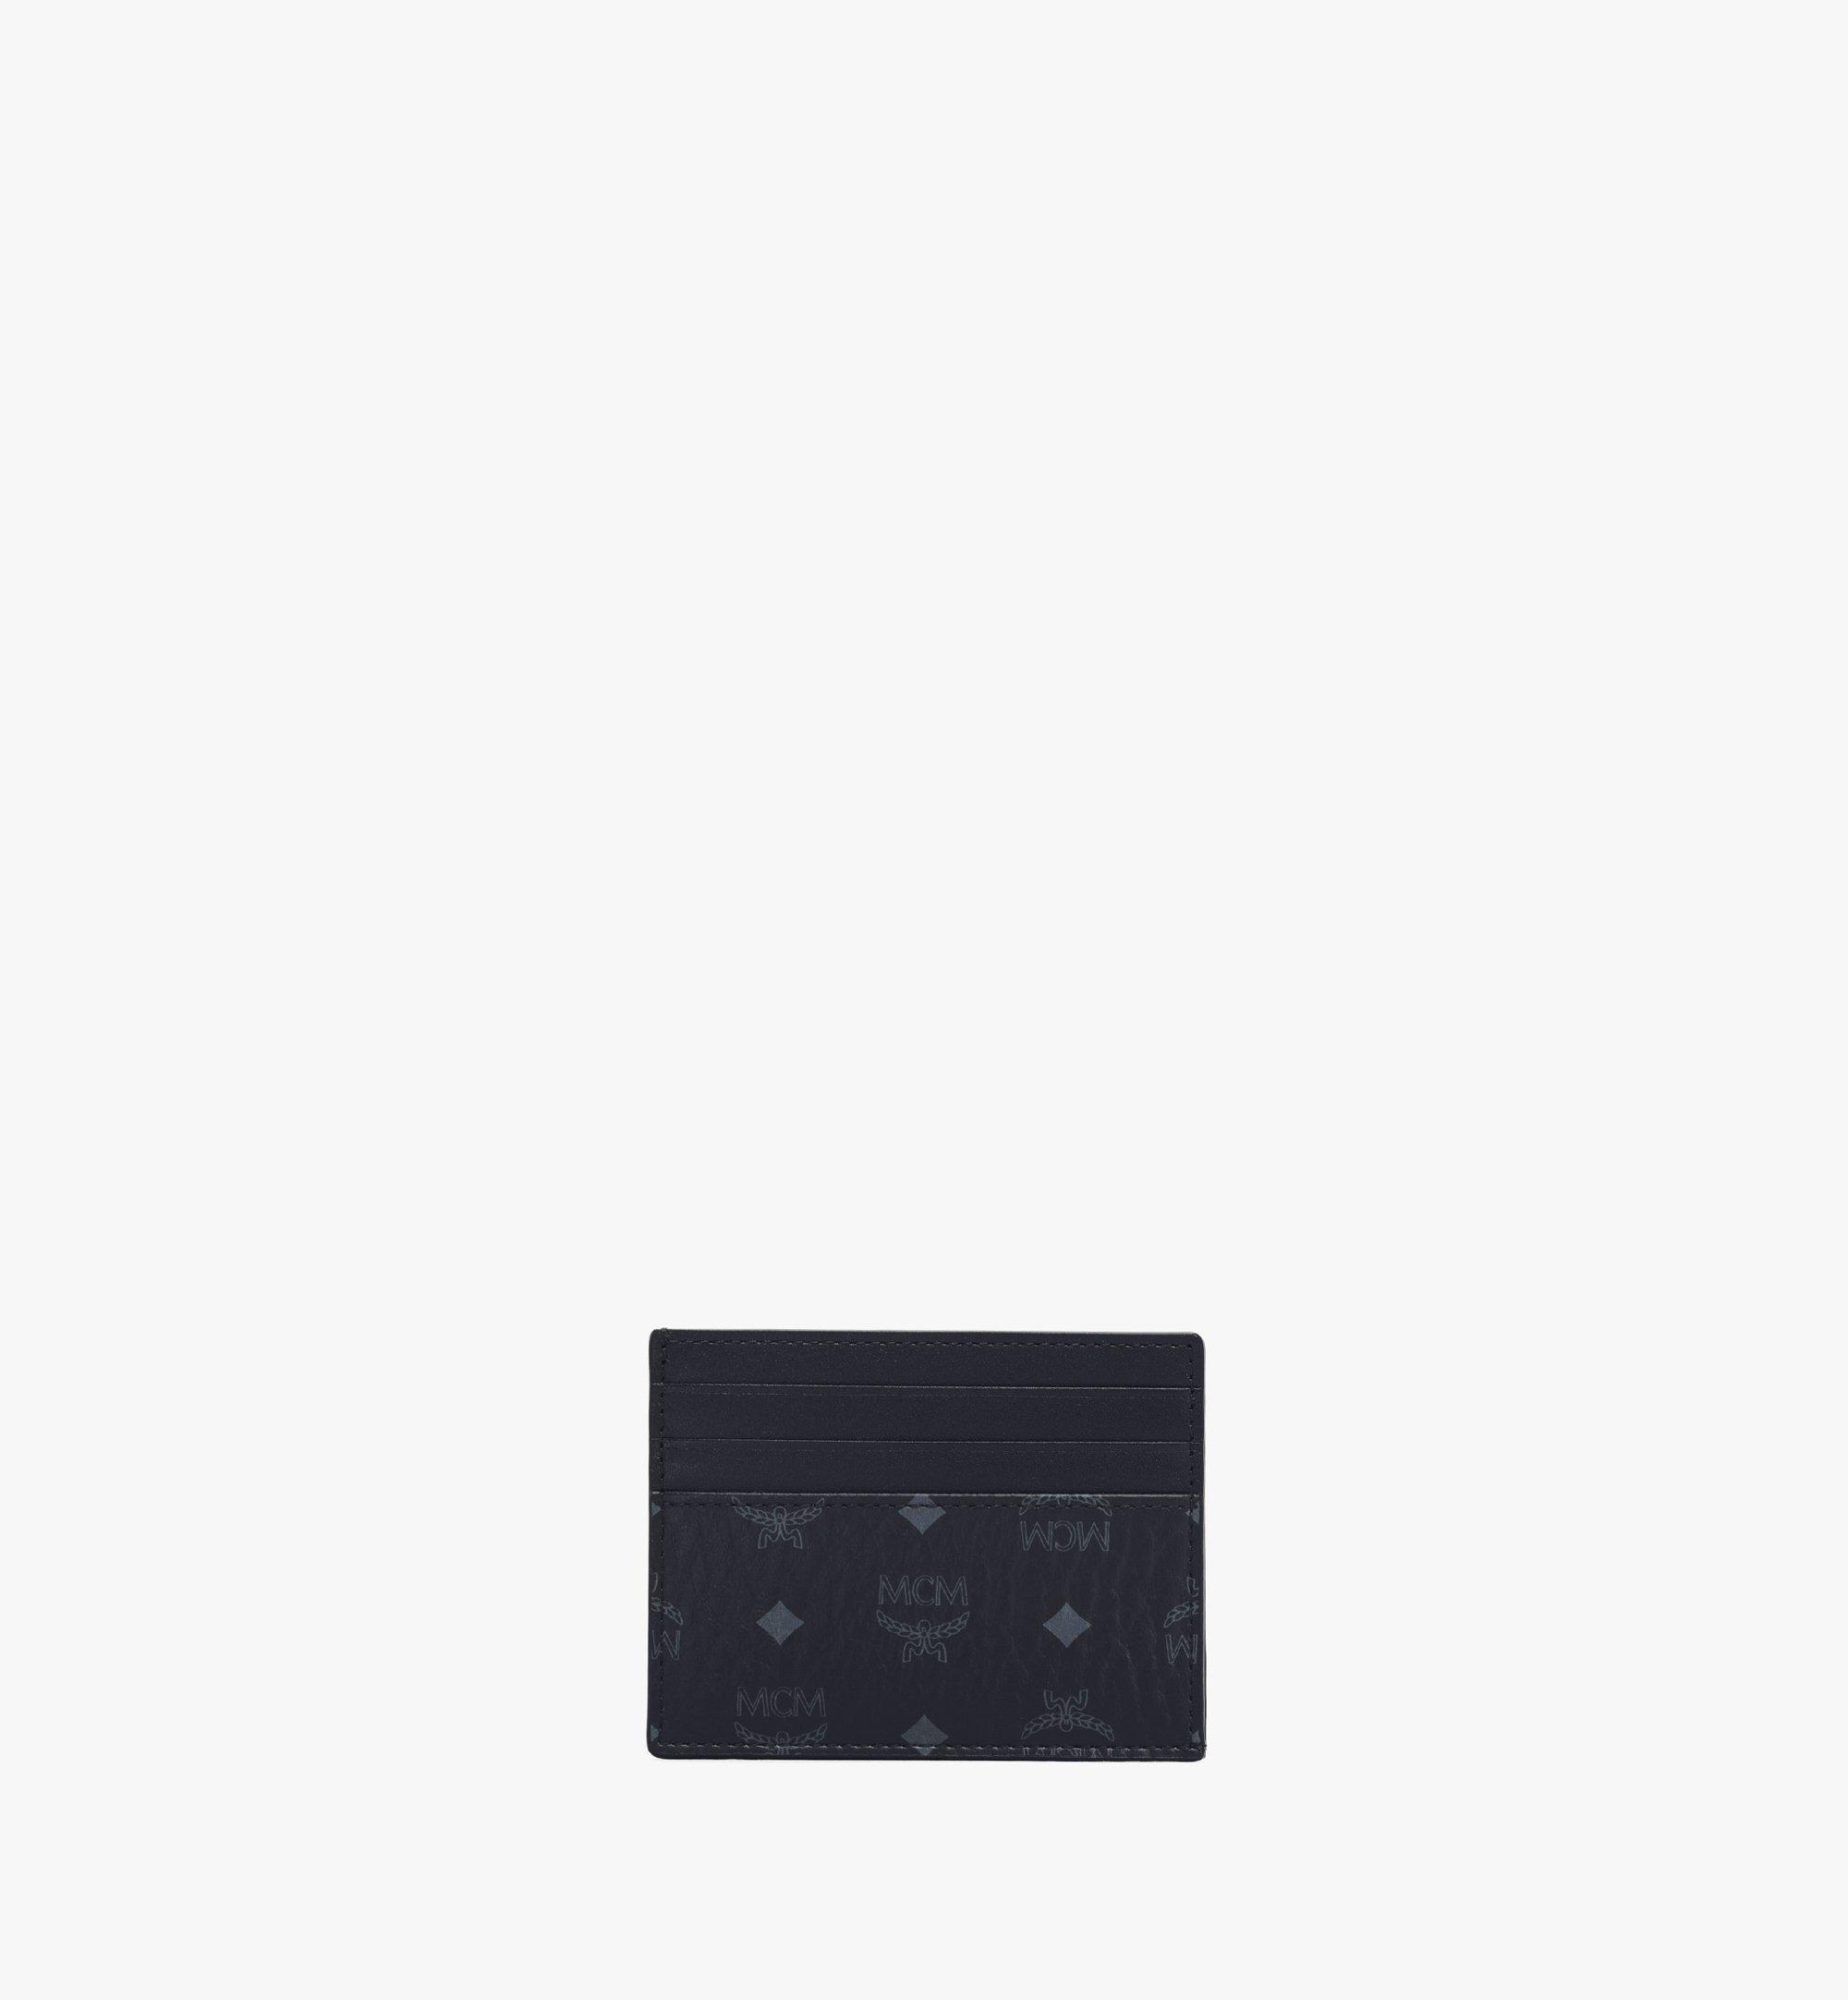 MCM Card Case in Visetos Original Black MXAAAVI02BK001 Alternate View 1